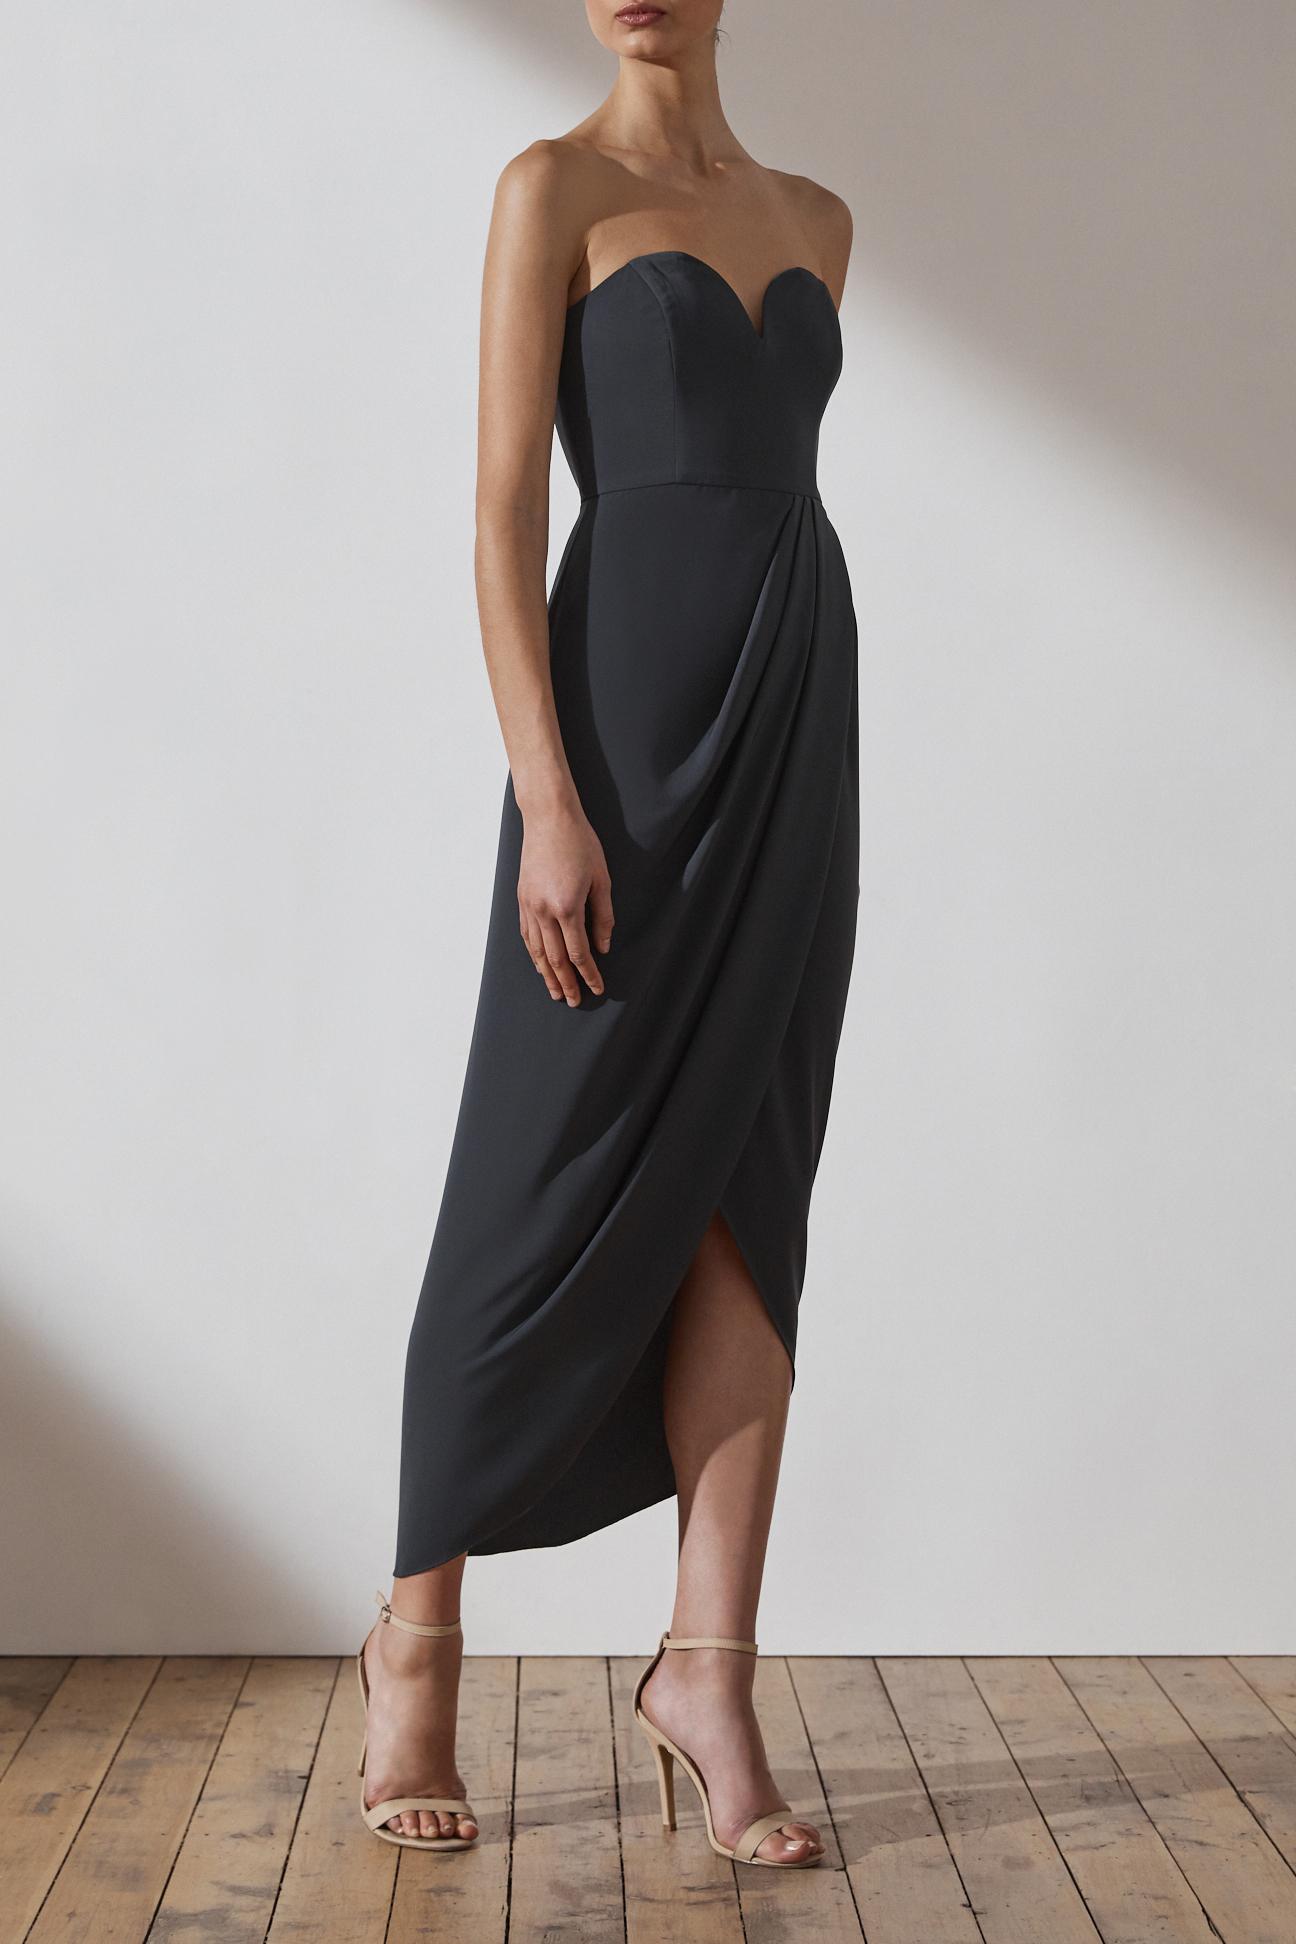 Shona Joy Zoe Bridesmaids Dress